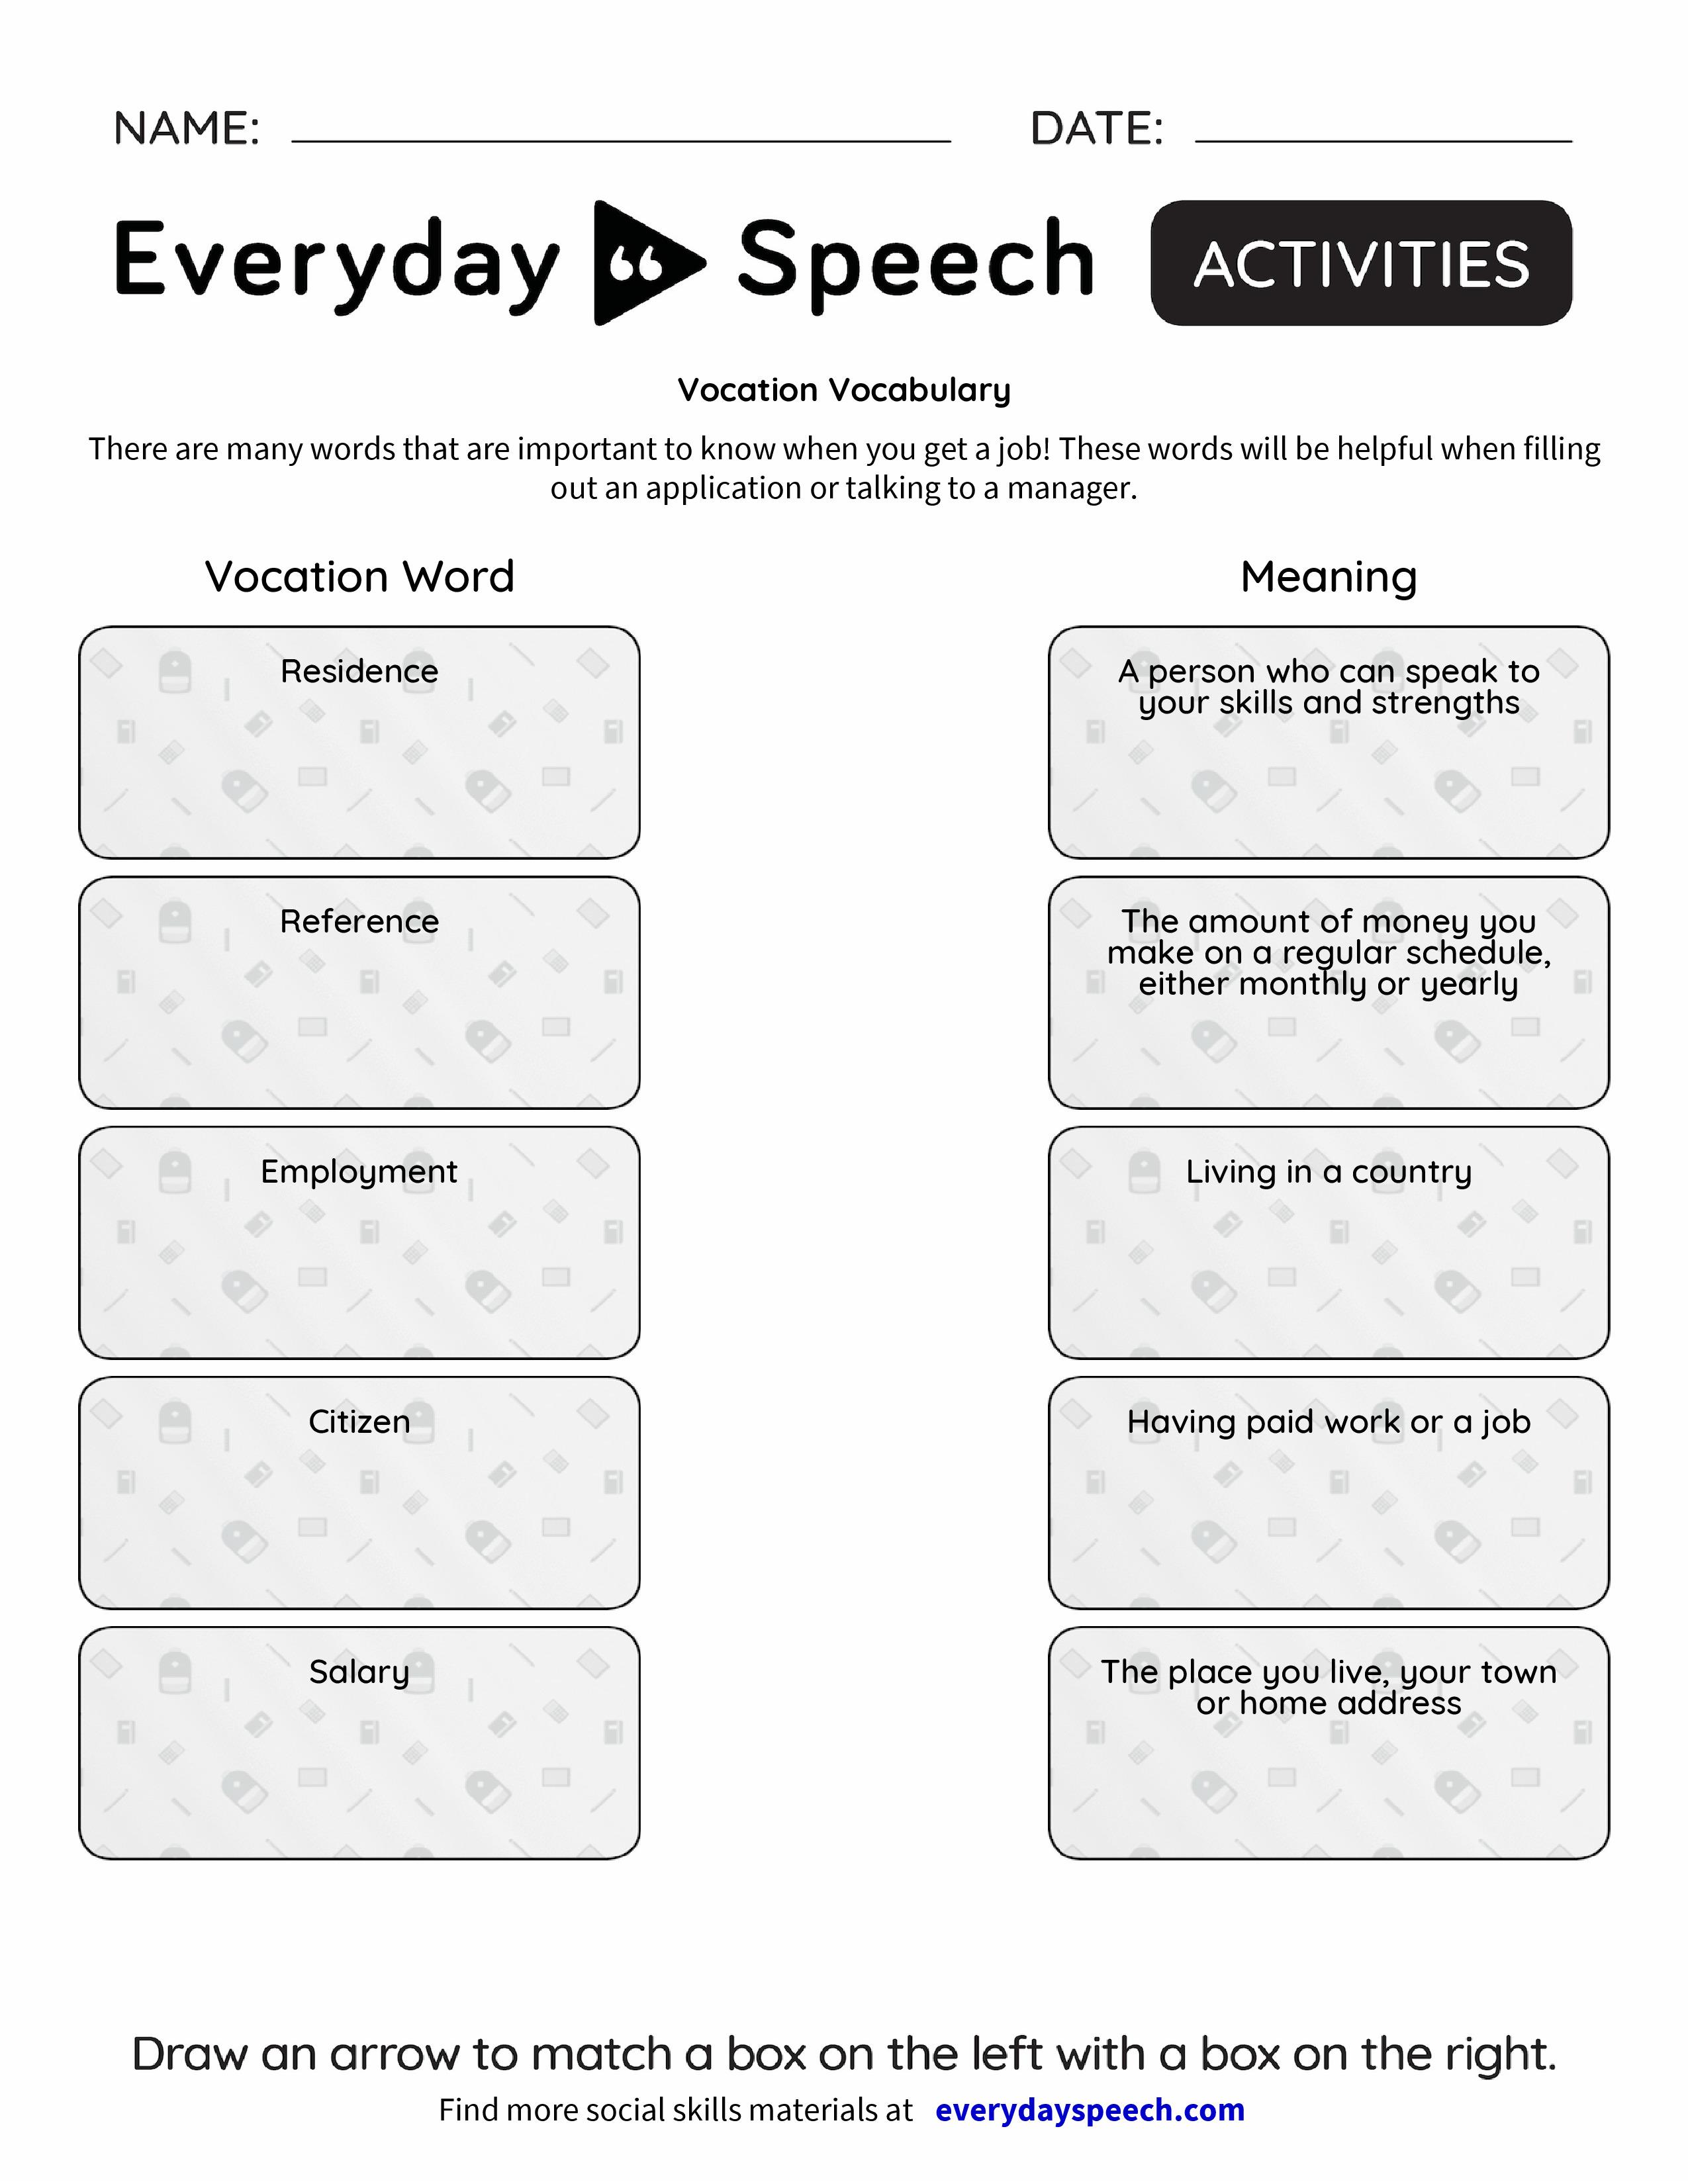 Vocation Vocabulary Everyday Speech Everyday Speech – Vocabulary Matching Worksheet